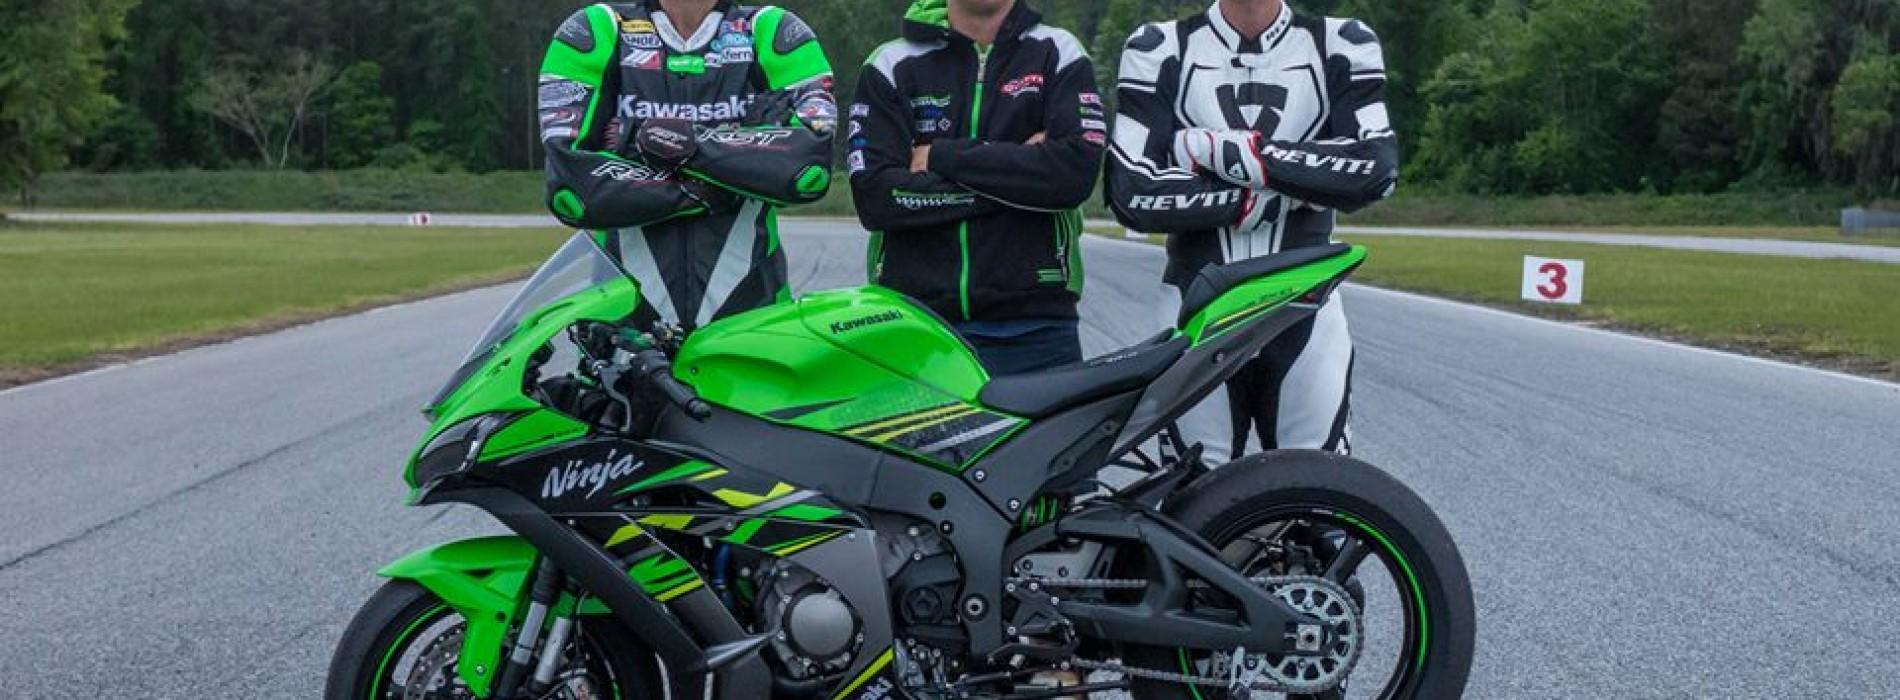 Team Palmetto Kawasaki